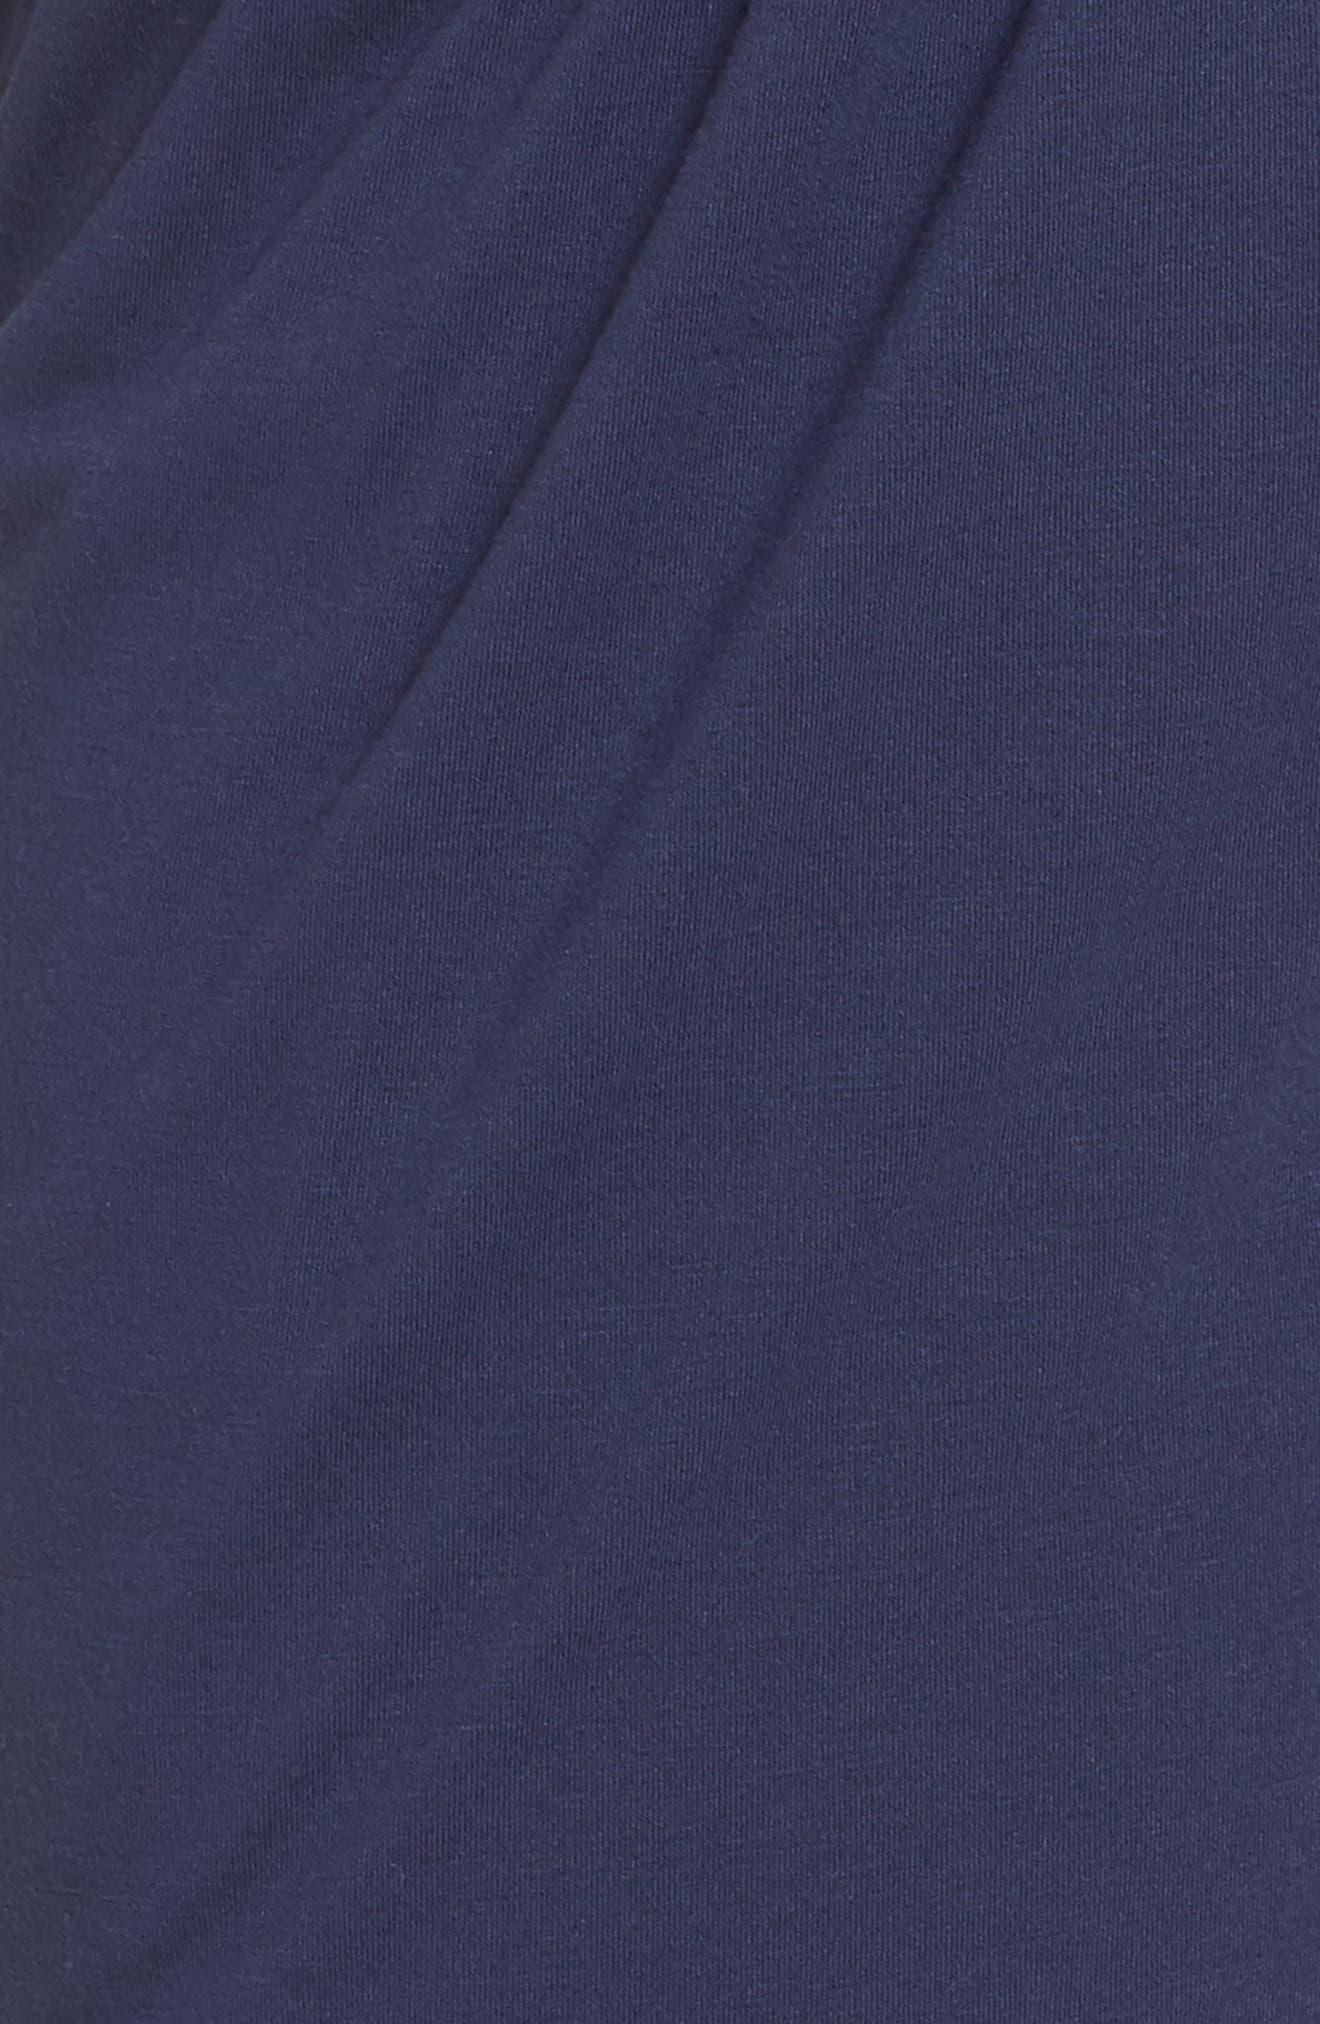 Foldover Waist Tulip Pants,                             Alternate thumbnail 6, color,                             THUNDER